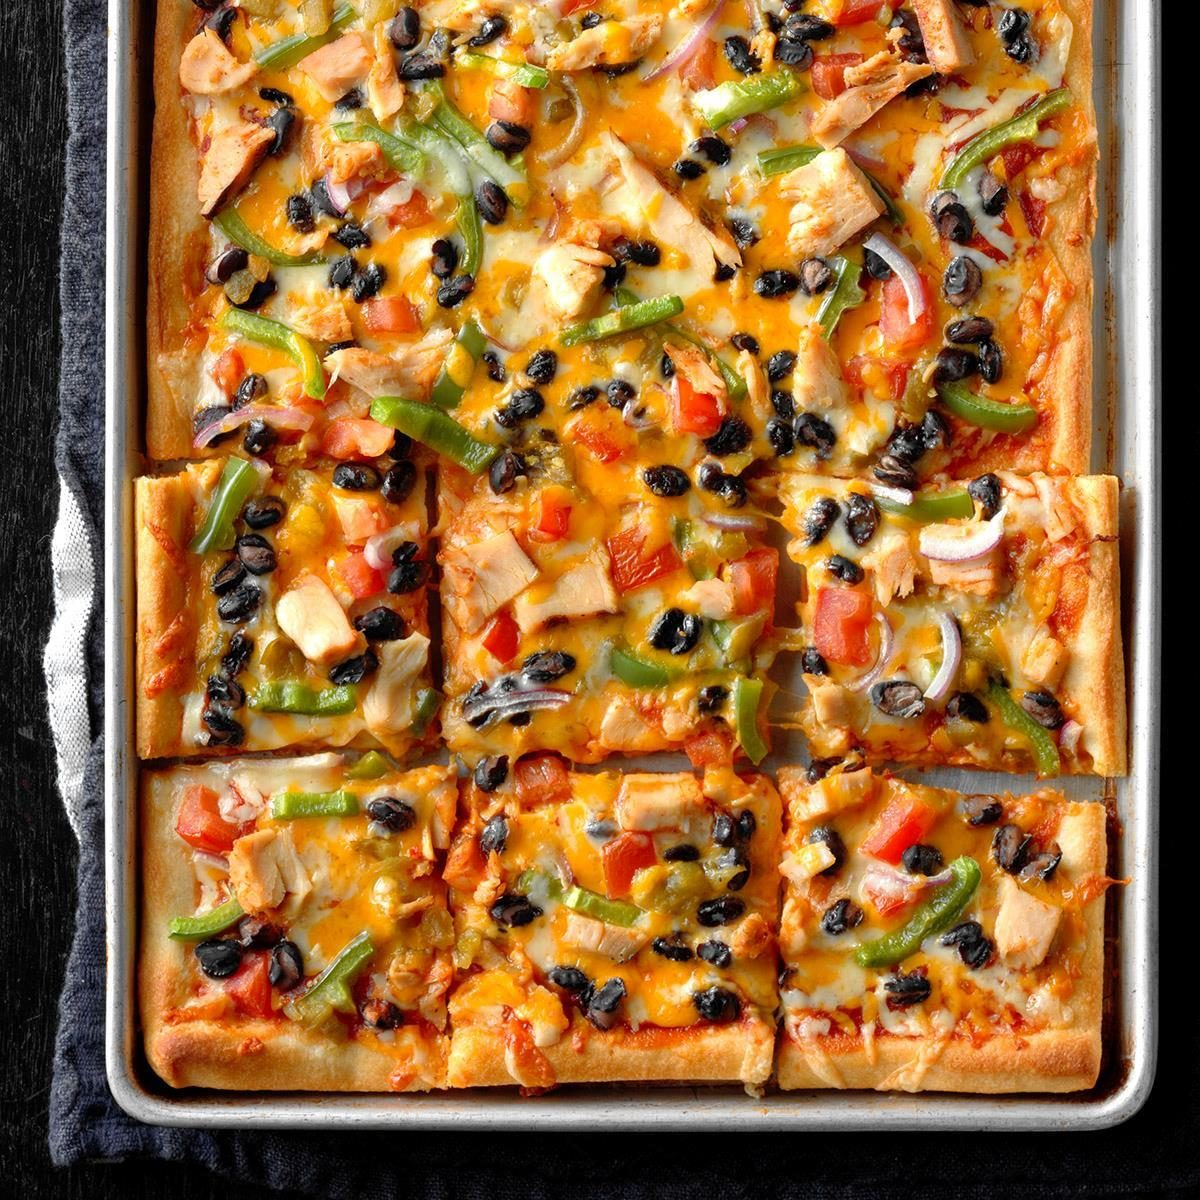 Saturday: Santa Fe Chicken Pizza Pie